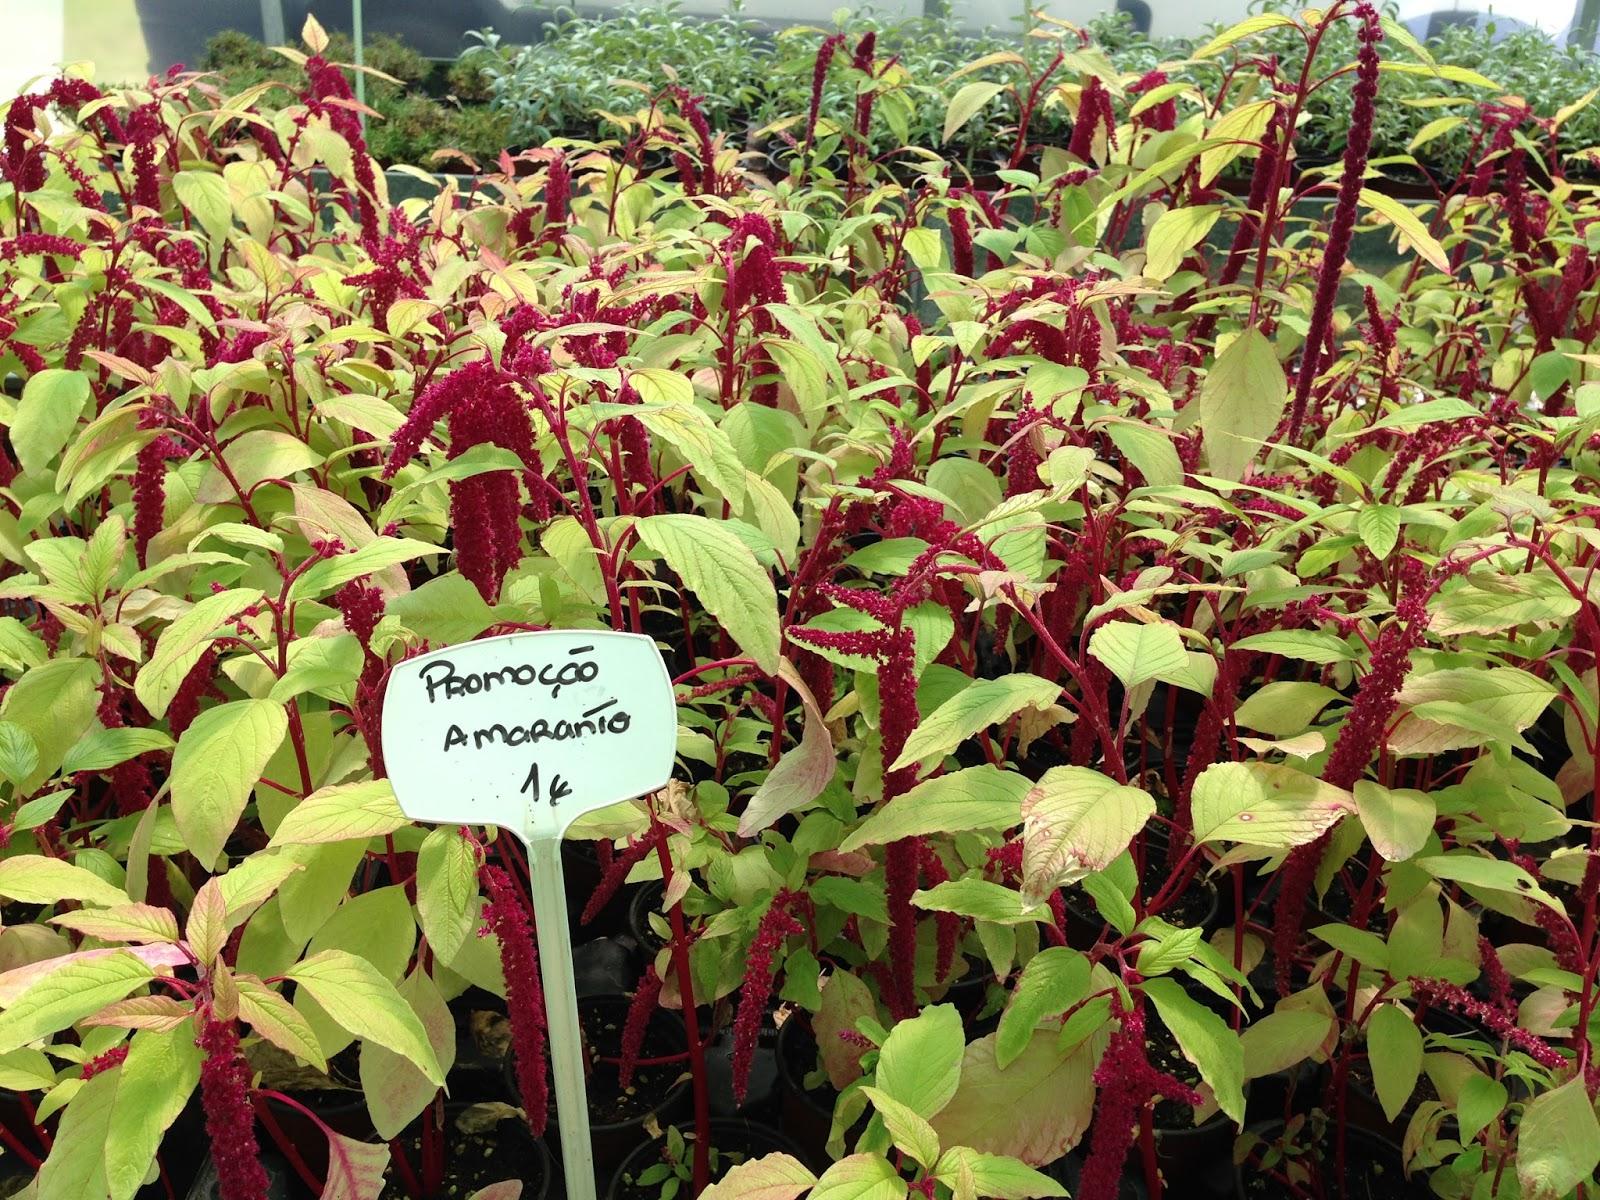 http://www.cantinhodasaromaticas.pt/loja/plantas-em-vaso-bio/amaranto-amaranthus-caudatus/